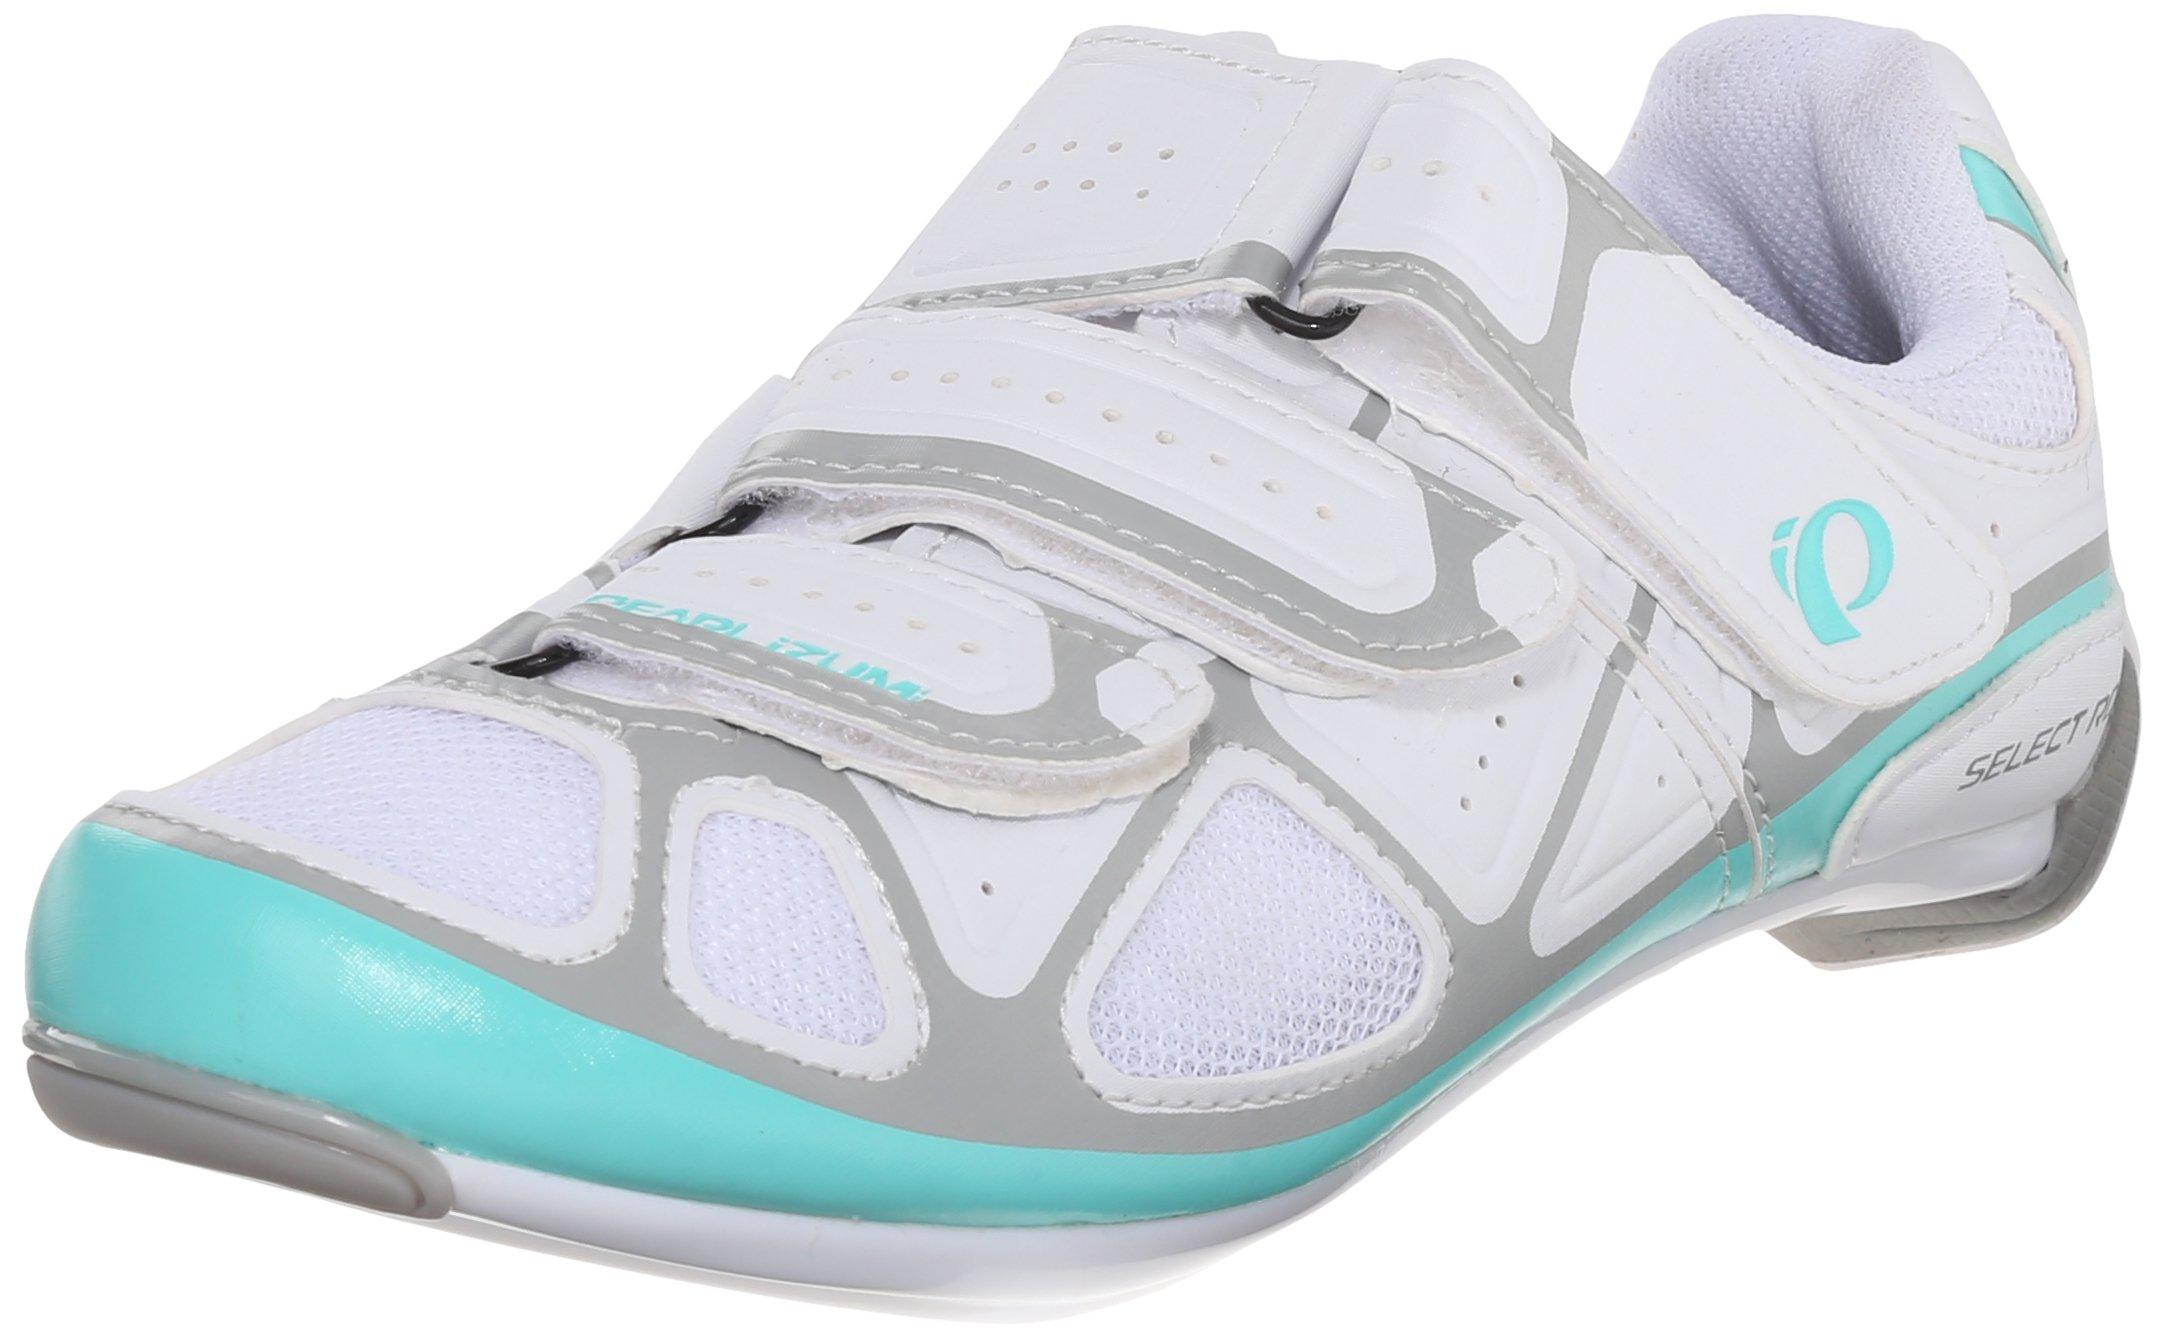 Pearl Izumi Women's W Select RD IV Cycling Shoe, White/Aqua Mint, 40 EU/8.3 B US